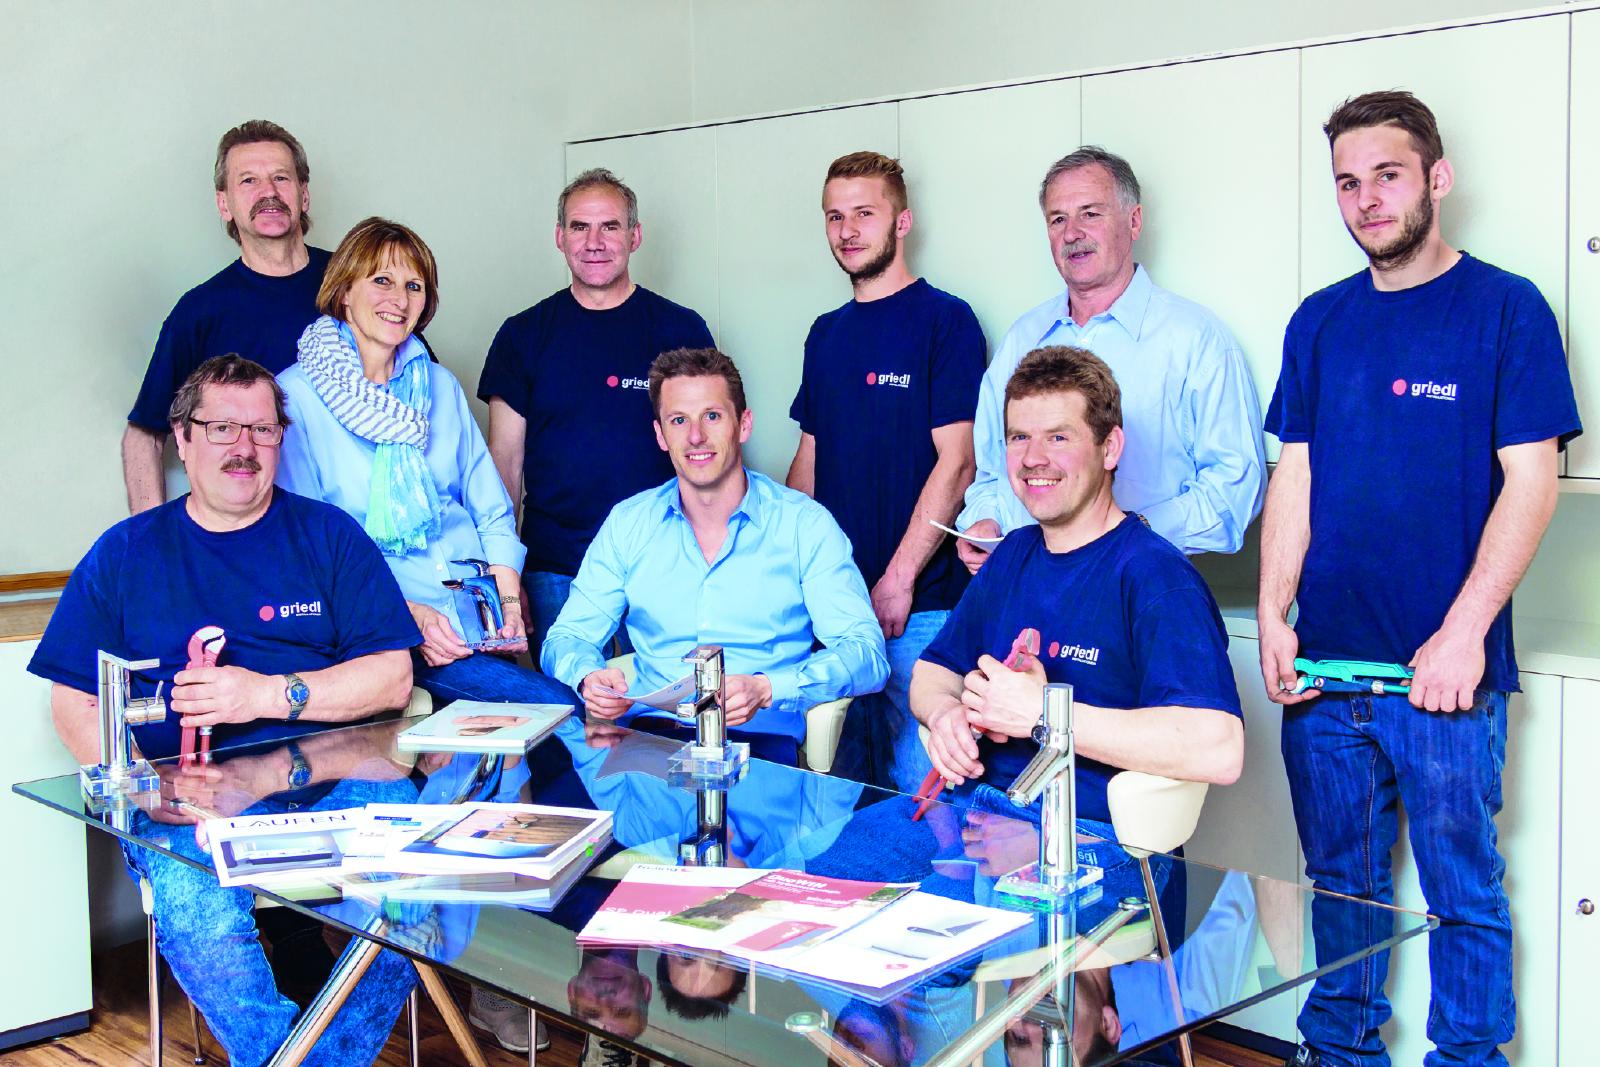 Griedl GmbH & Co KG